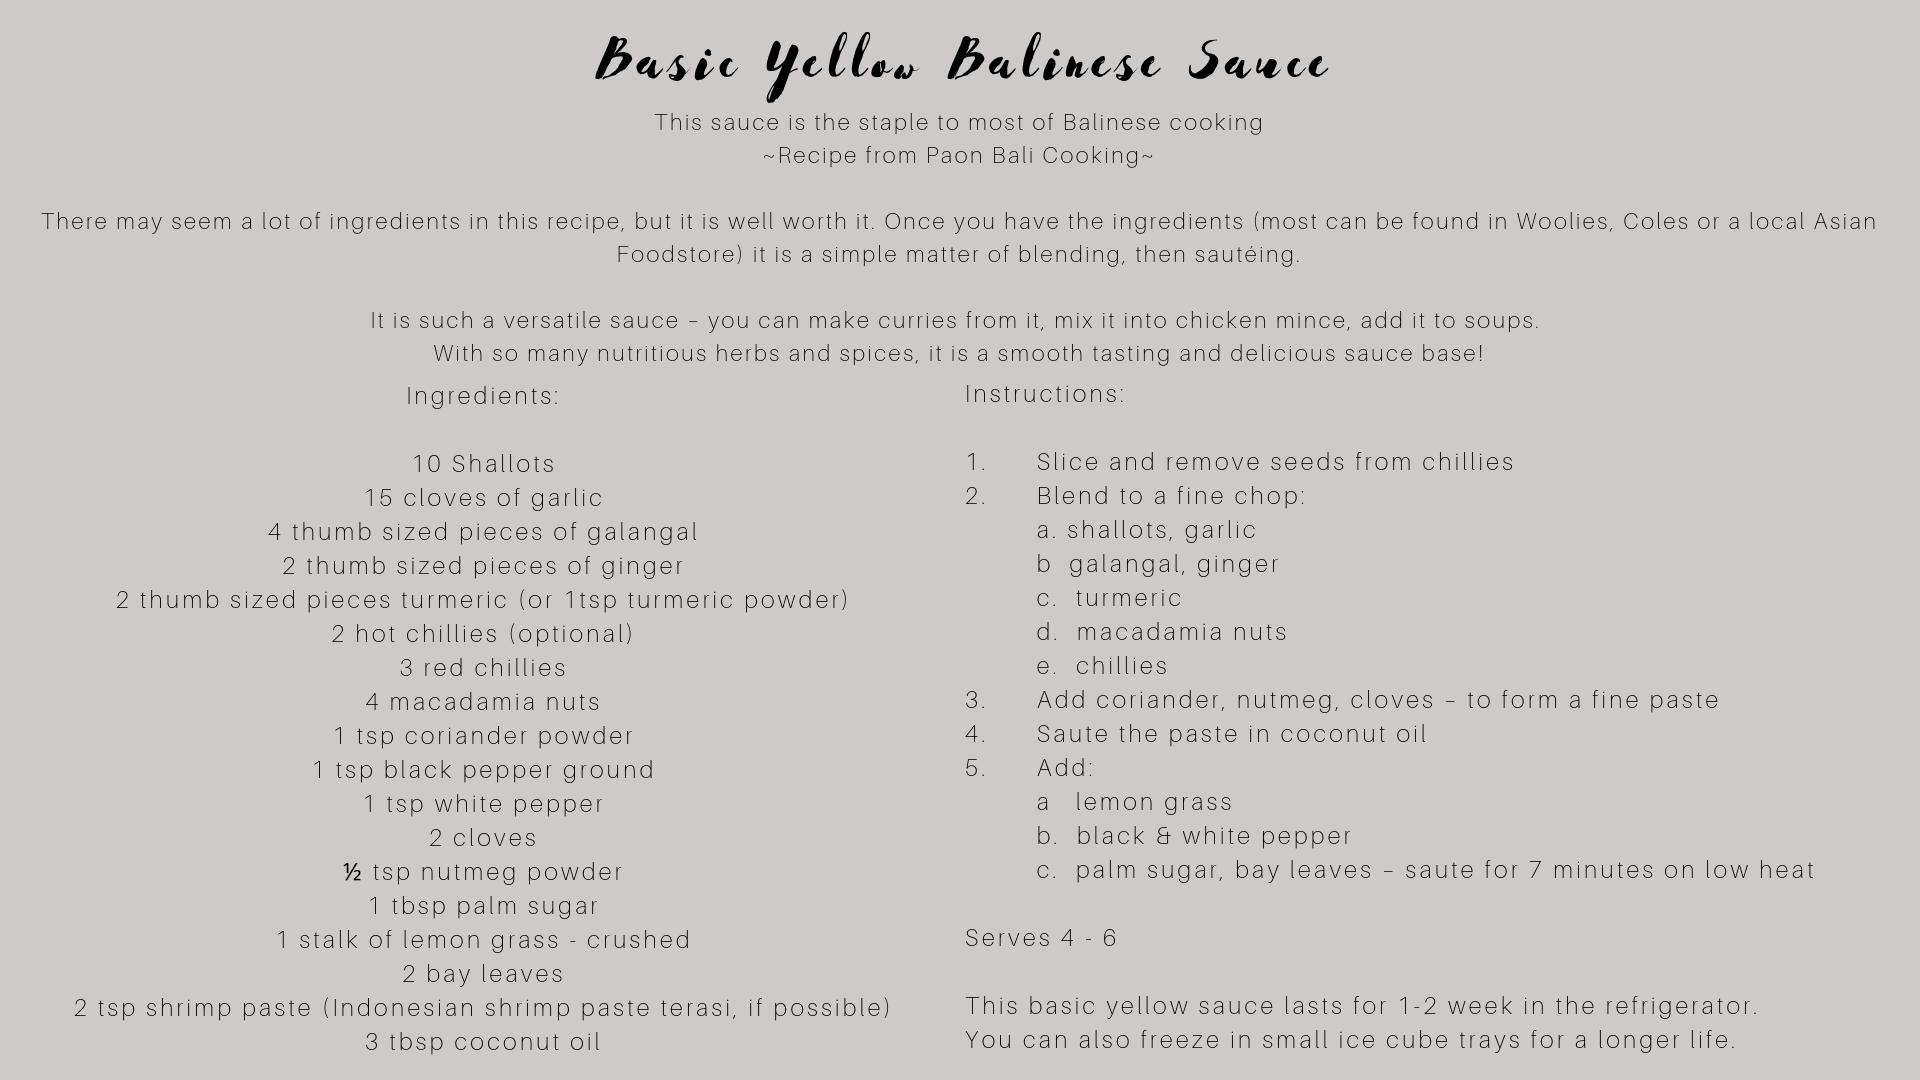 Basic-Yellow-Balinese-Sauce-revised